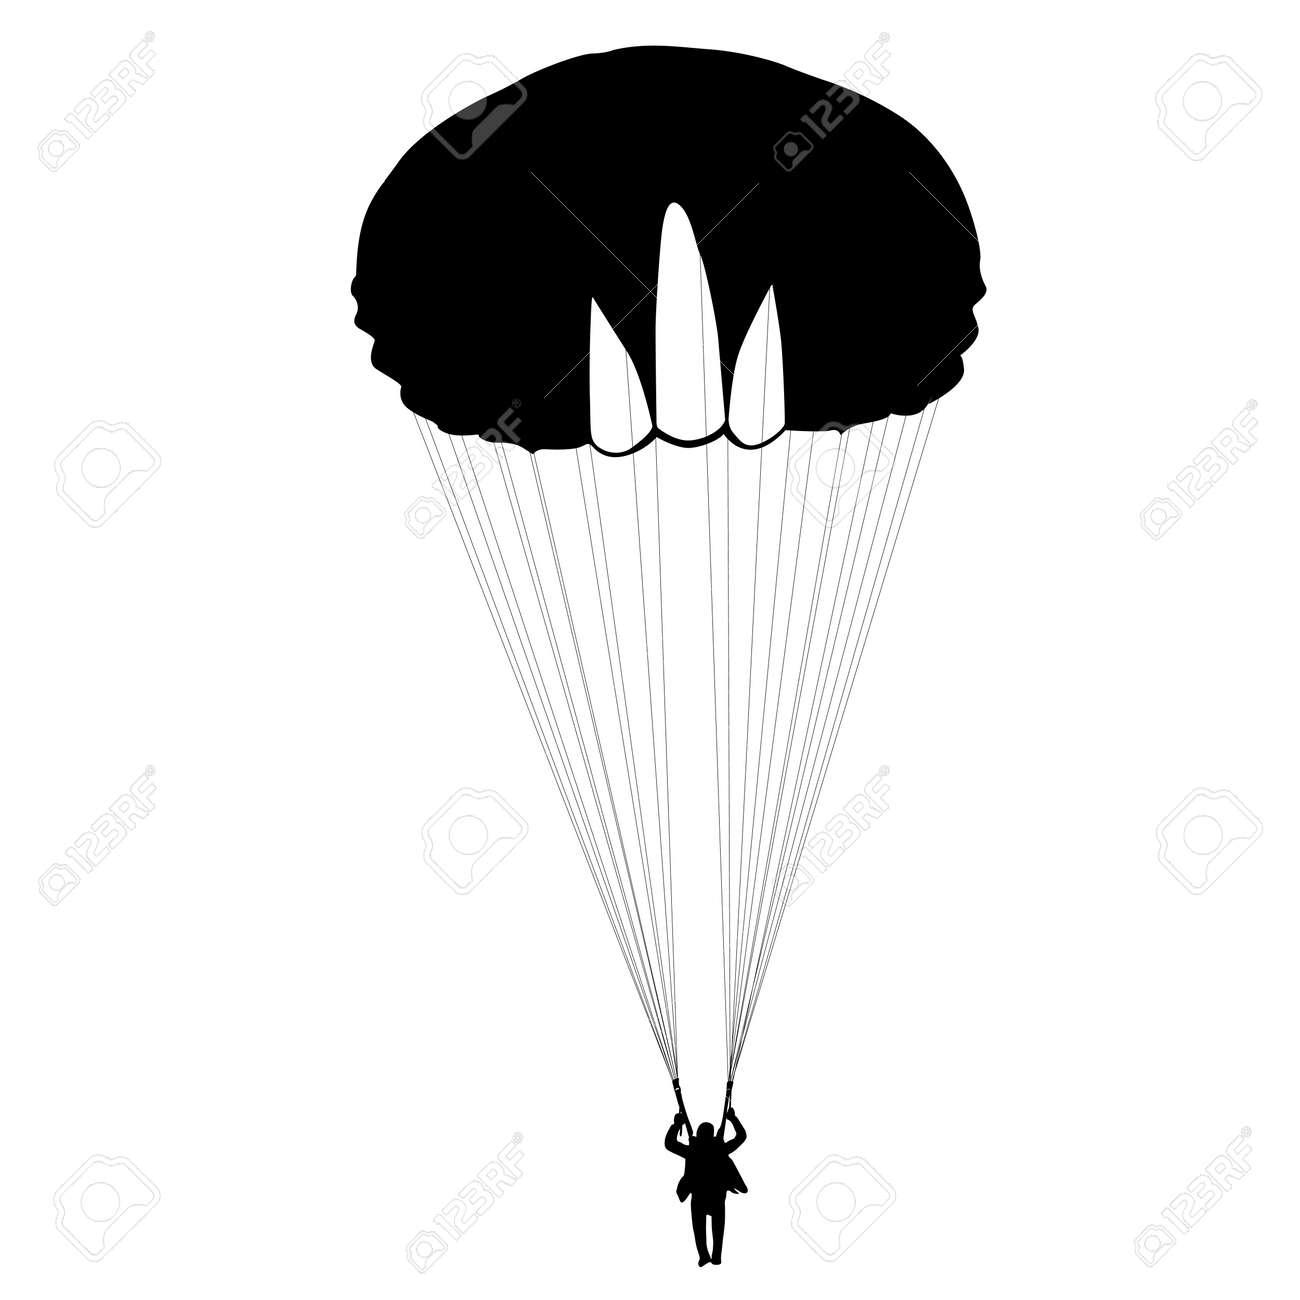 skydiver silhouettes parachuting vector illustration royalty free rh 123rf com parachute vector art parachute vector free